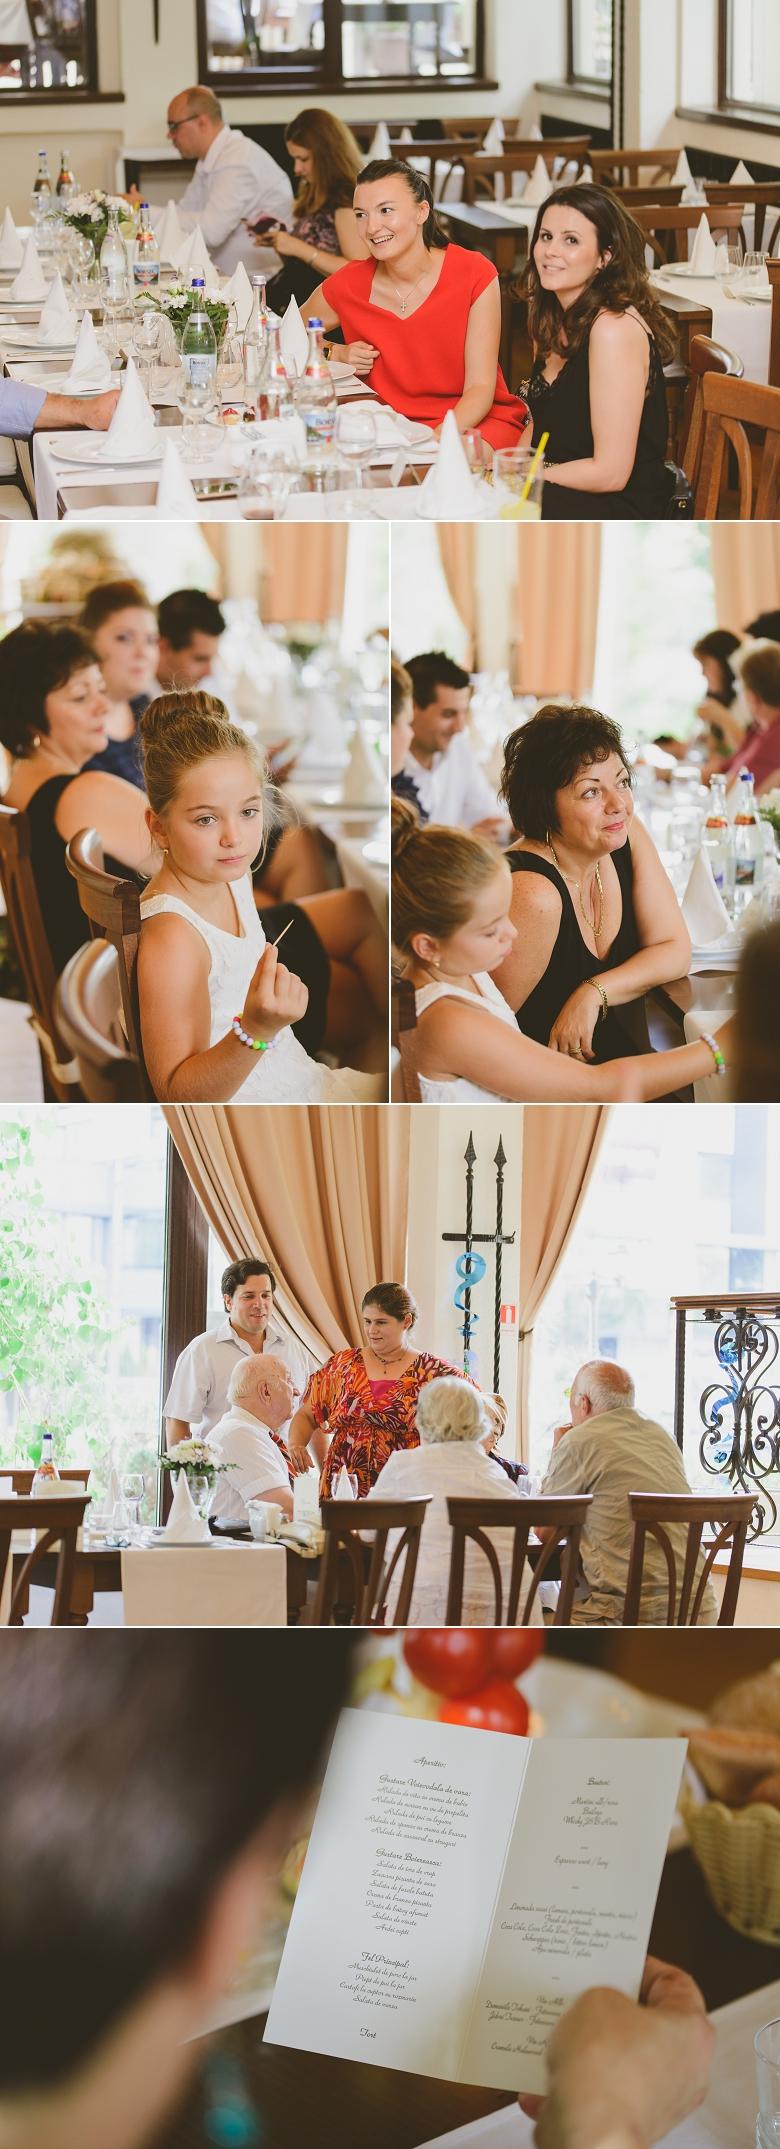 poze-botez-bucuresti-baia-mare-foto-video-botez-baia-mare 13